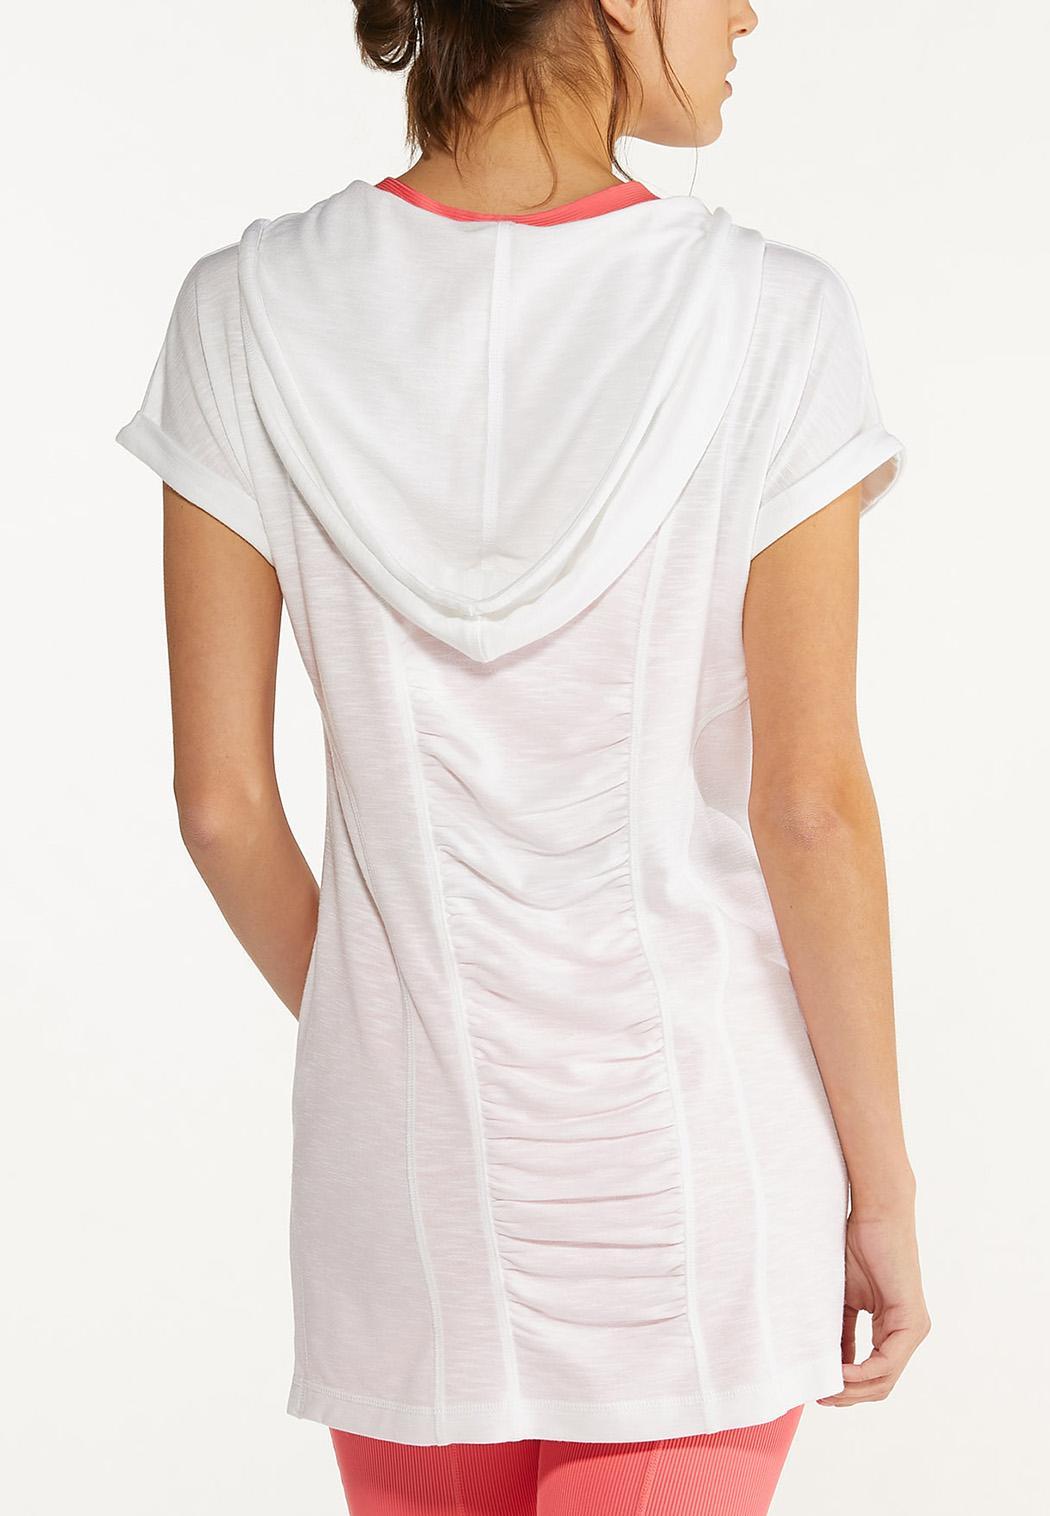 Plus Size White Zippered Hoodie (Item #44602880)